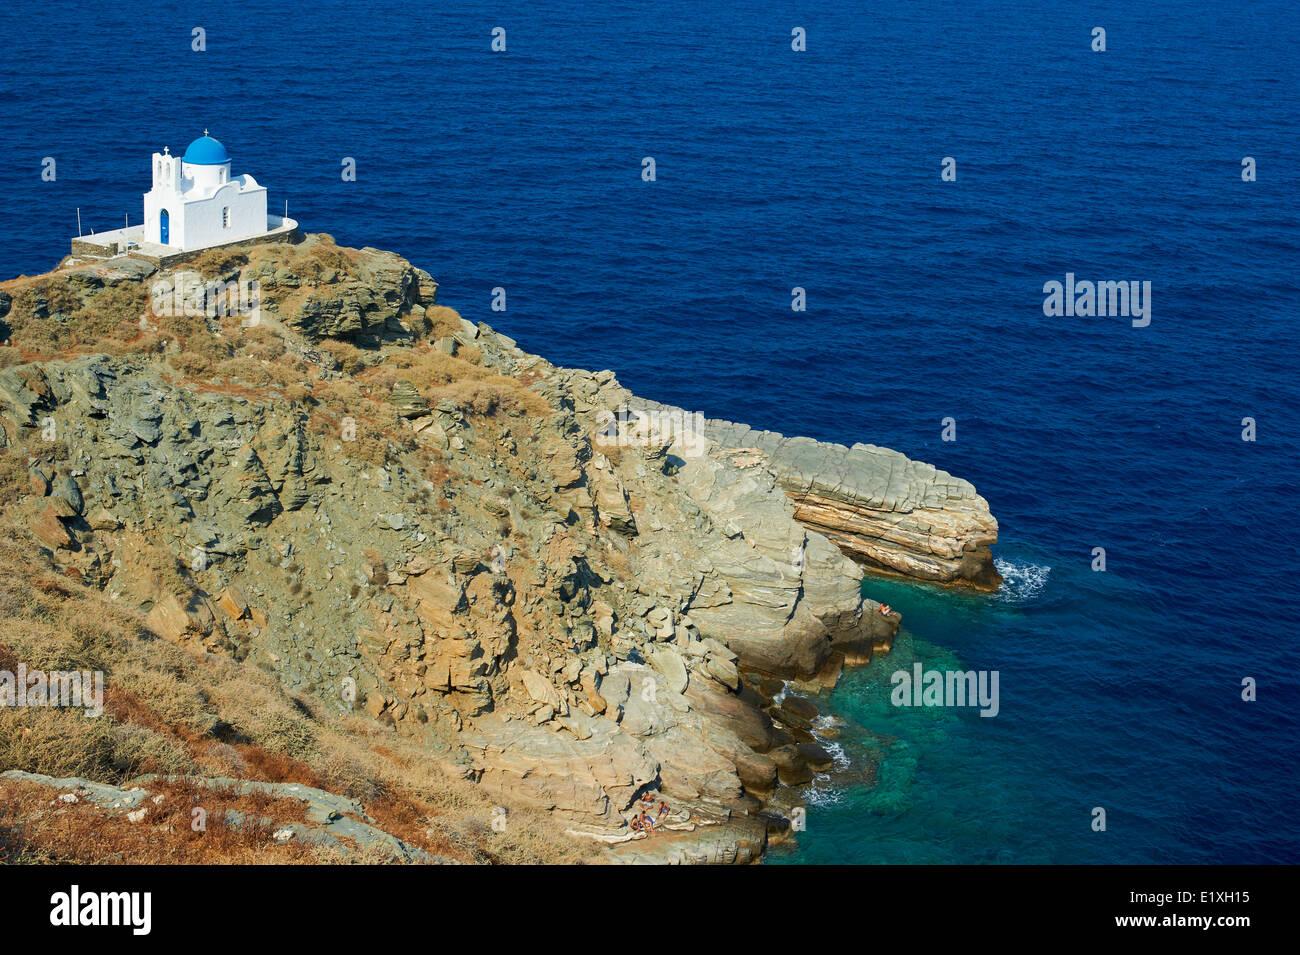 Greece, Cyclades islands, Sifnos, Seven Martyrs chapel, Kastro village - Stock Image